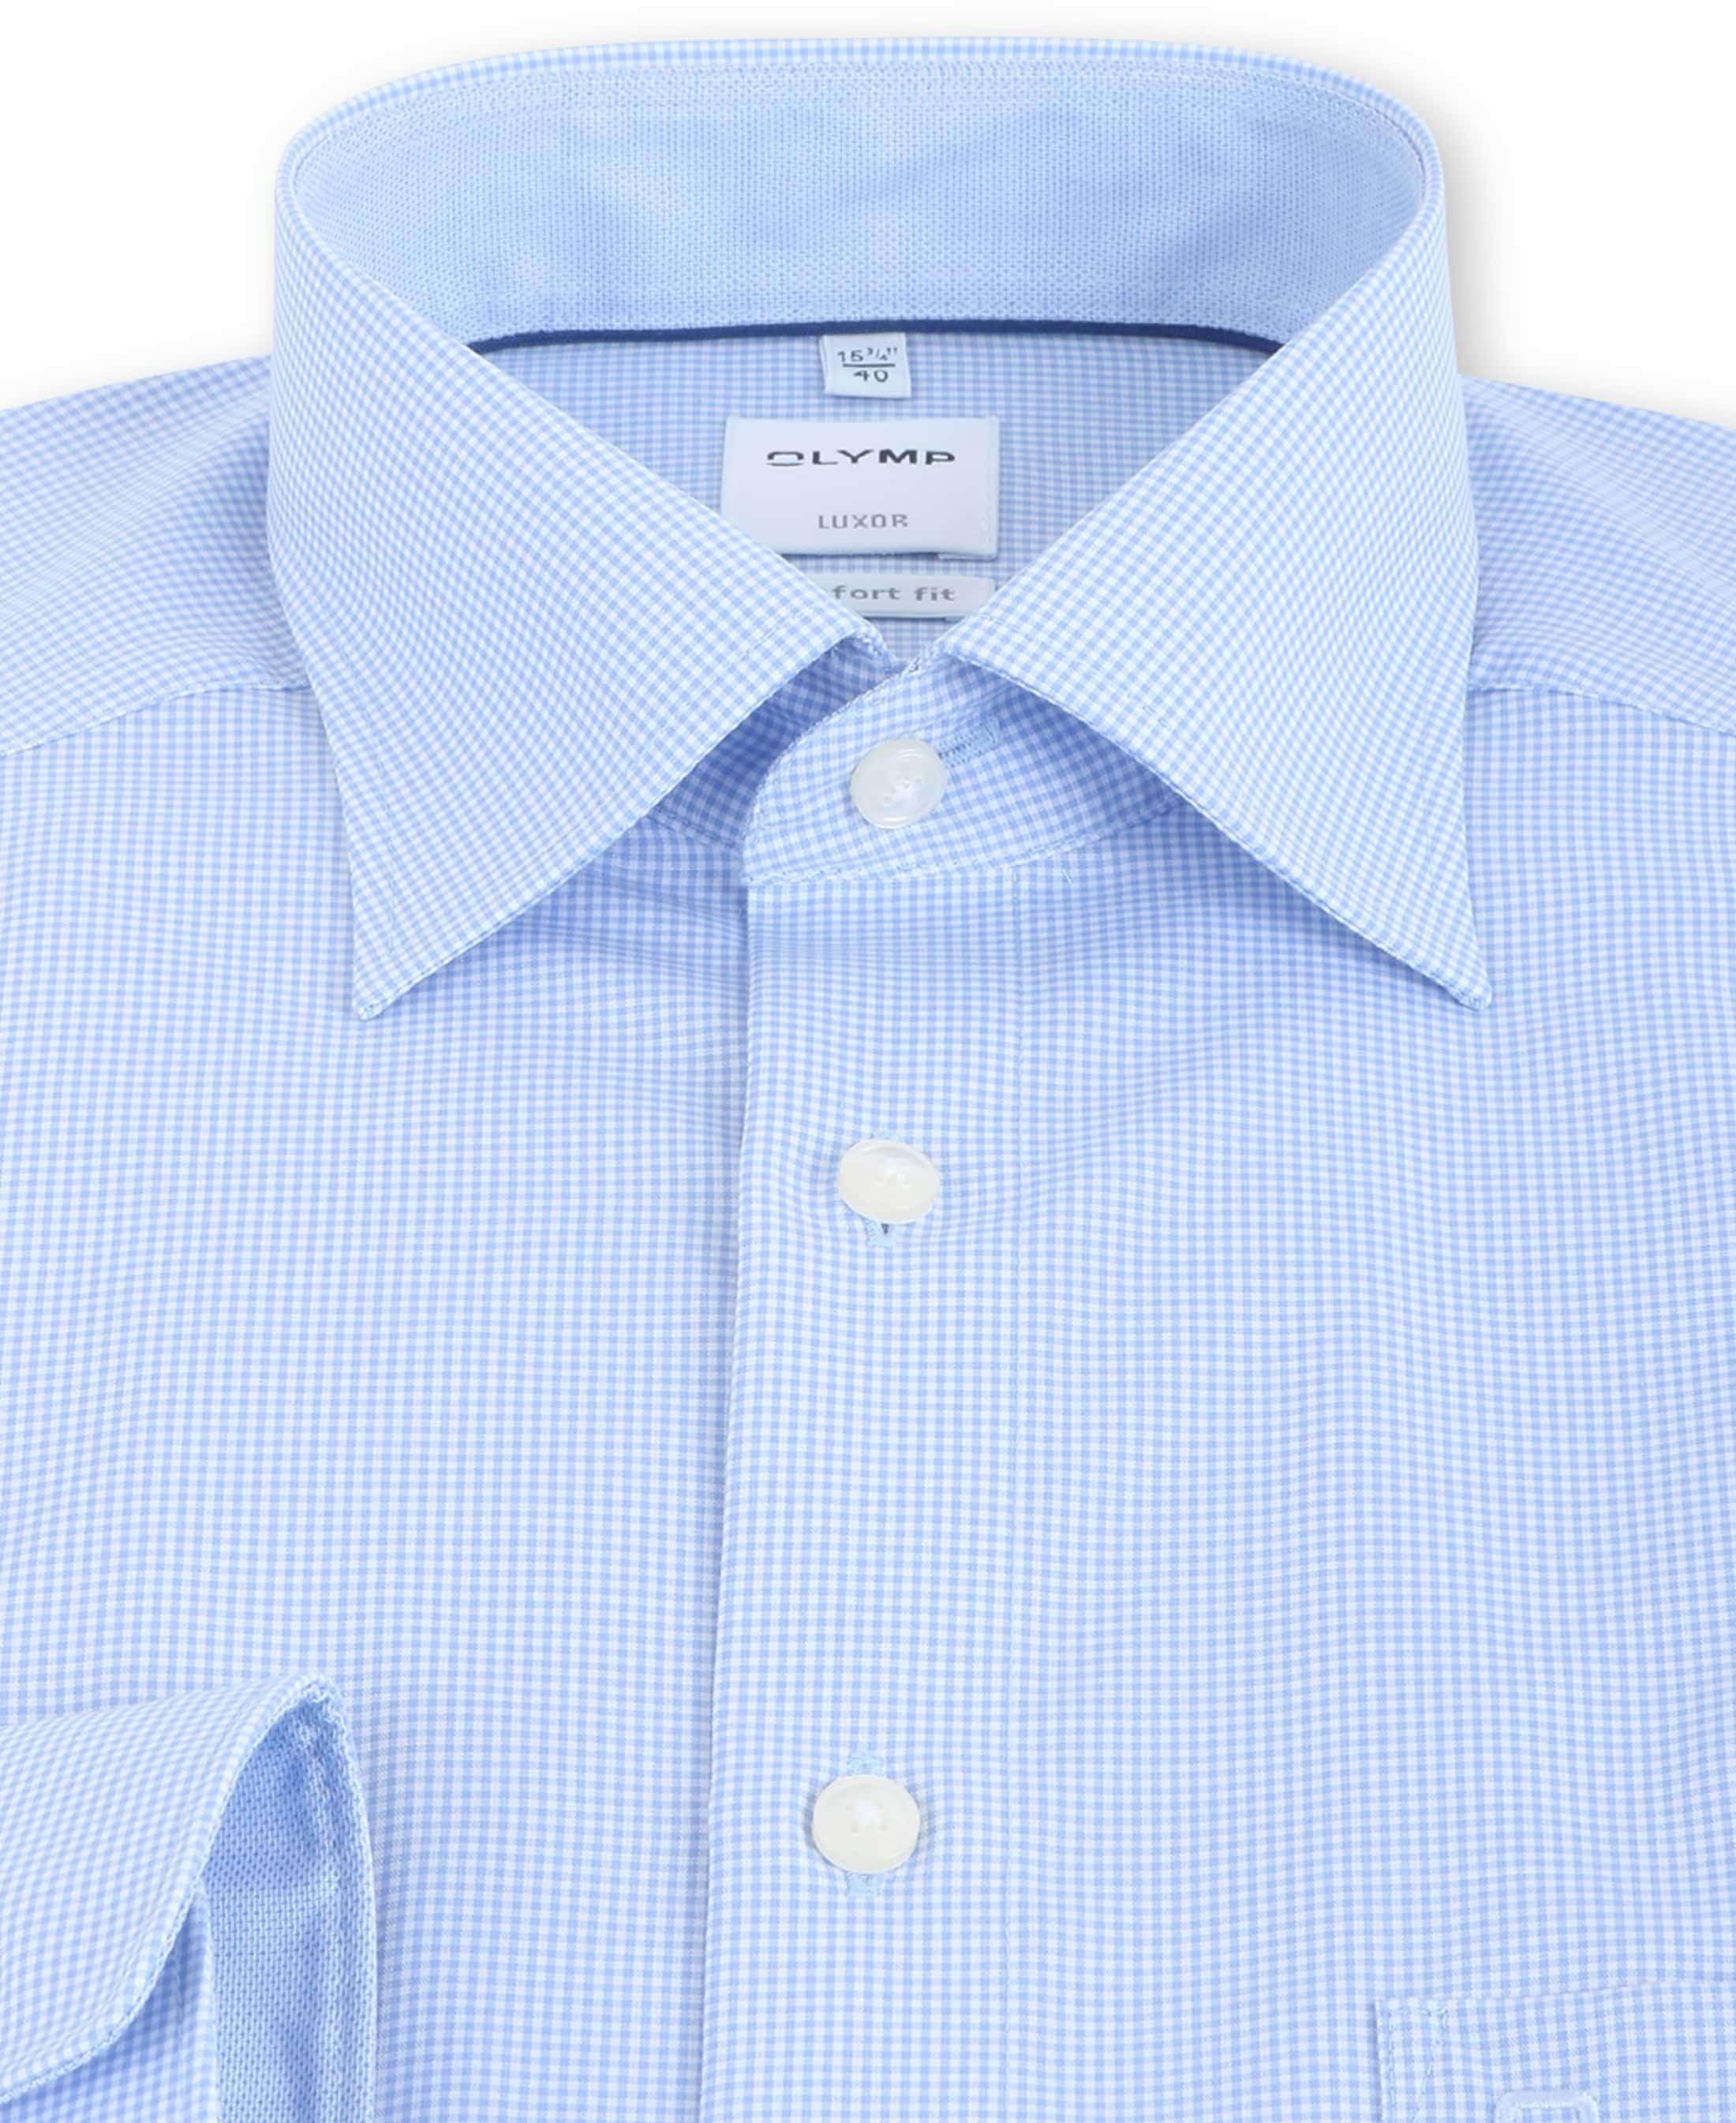 OLYMP Luxor Comfort Fit Shirt Blauw Ruit foto 2